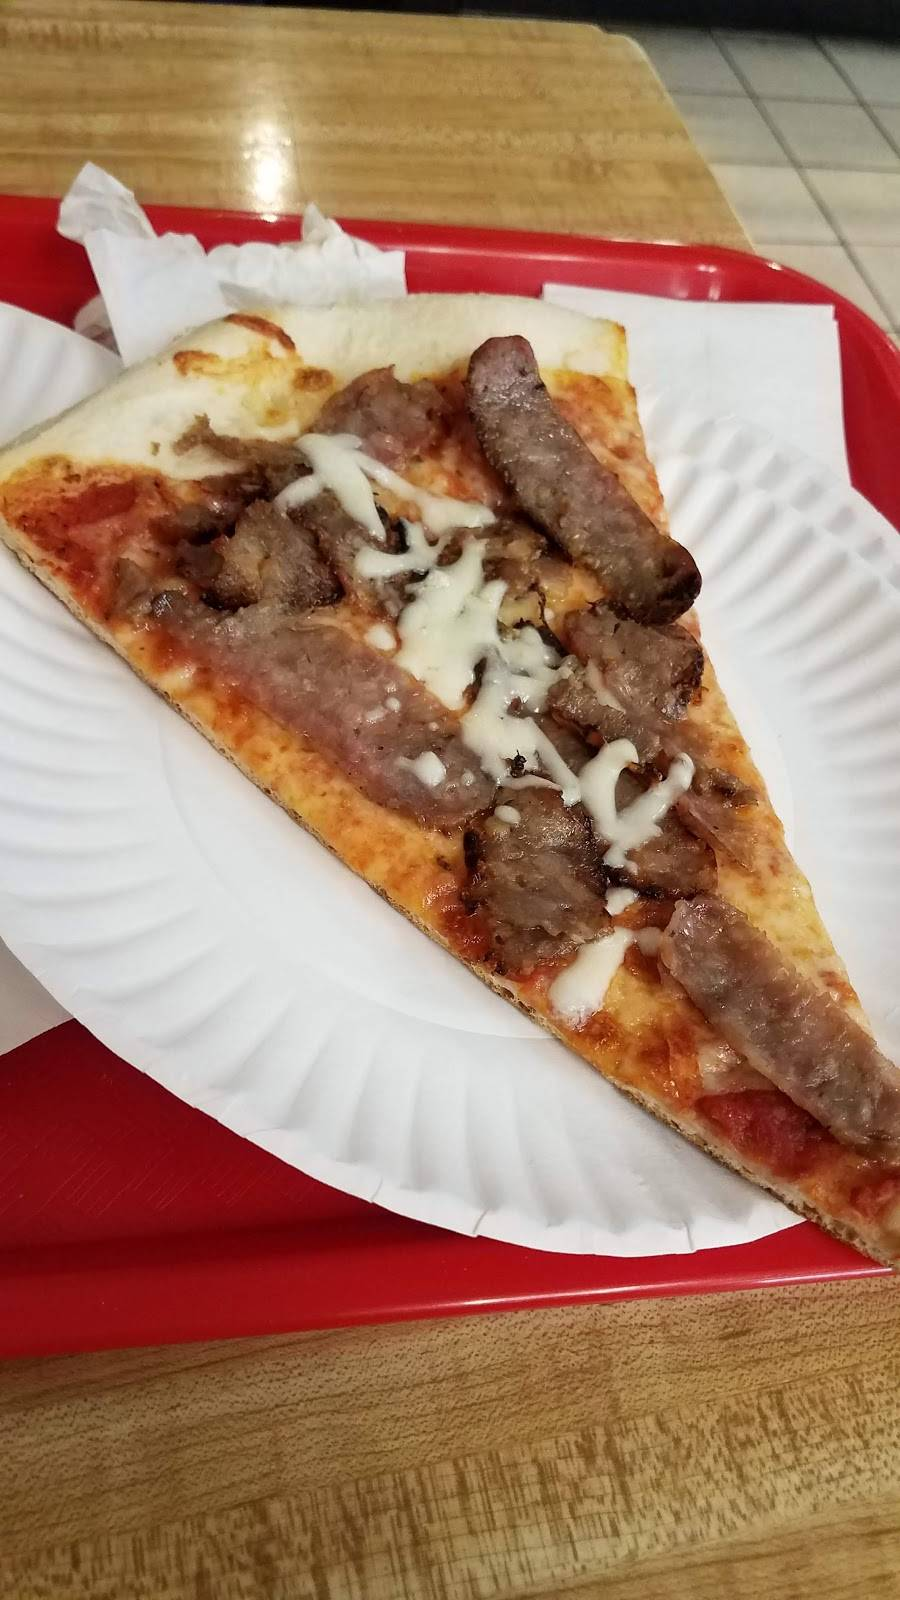 Giovannis Pizza | restaurant | 76 E 167th St, Bronx, NY 10452, USA | 7185382054 OR +1 718-538-2054